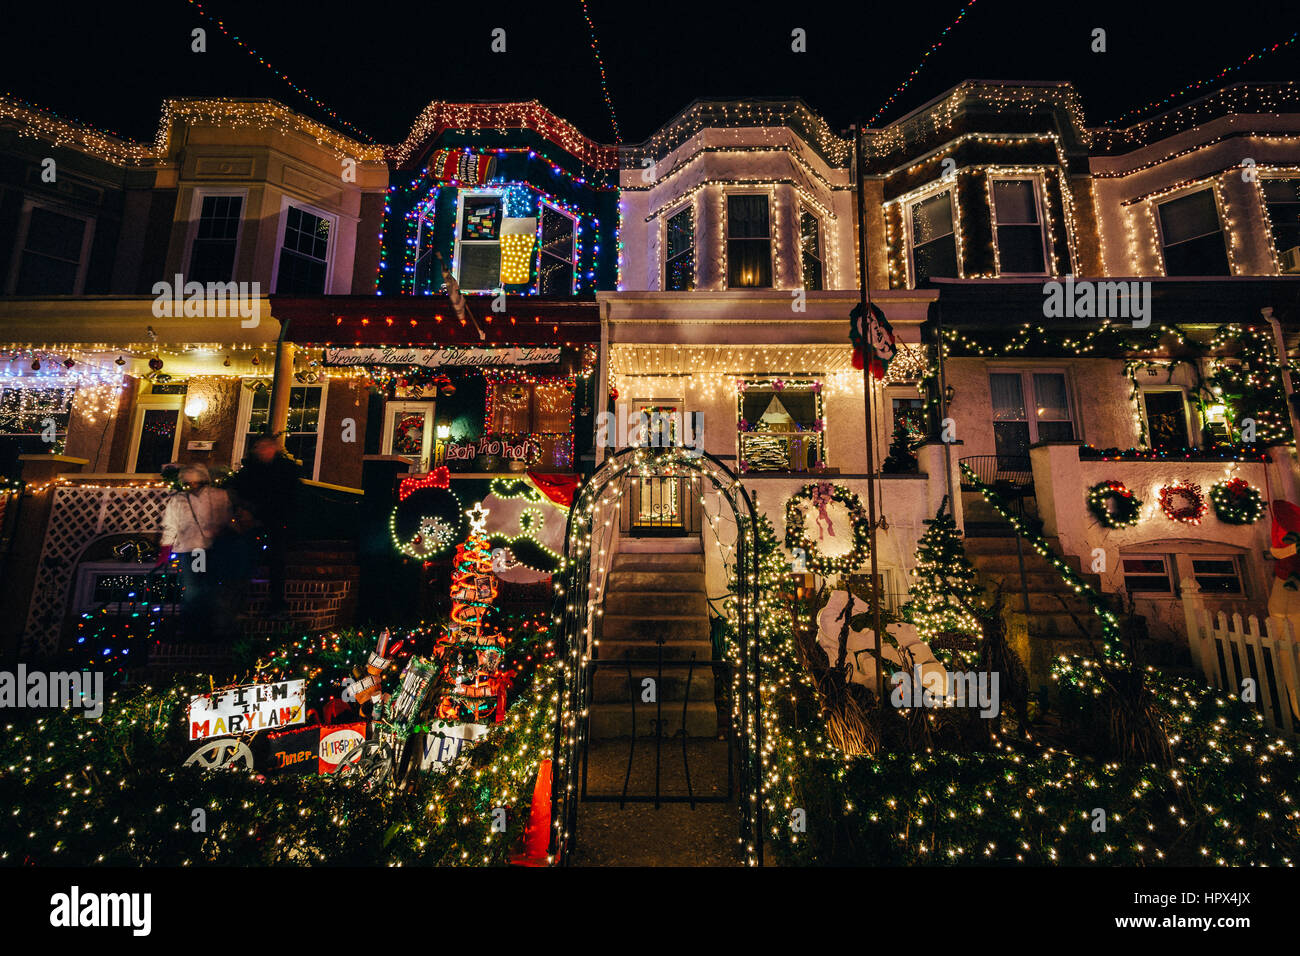 Baltimore Christmas 2021 34th Street Baltimore Christmas High Resolution Stock Photography And Images Alamy